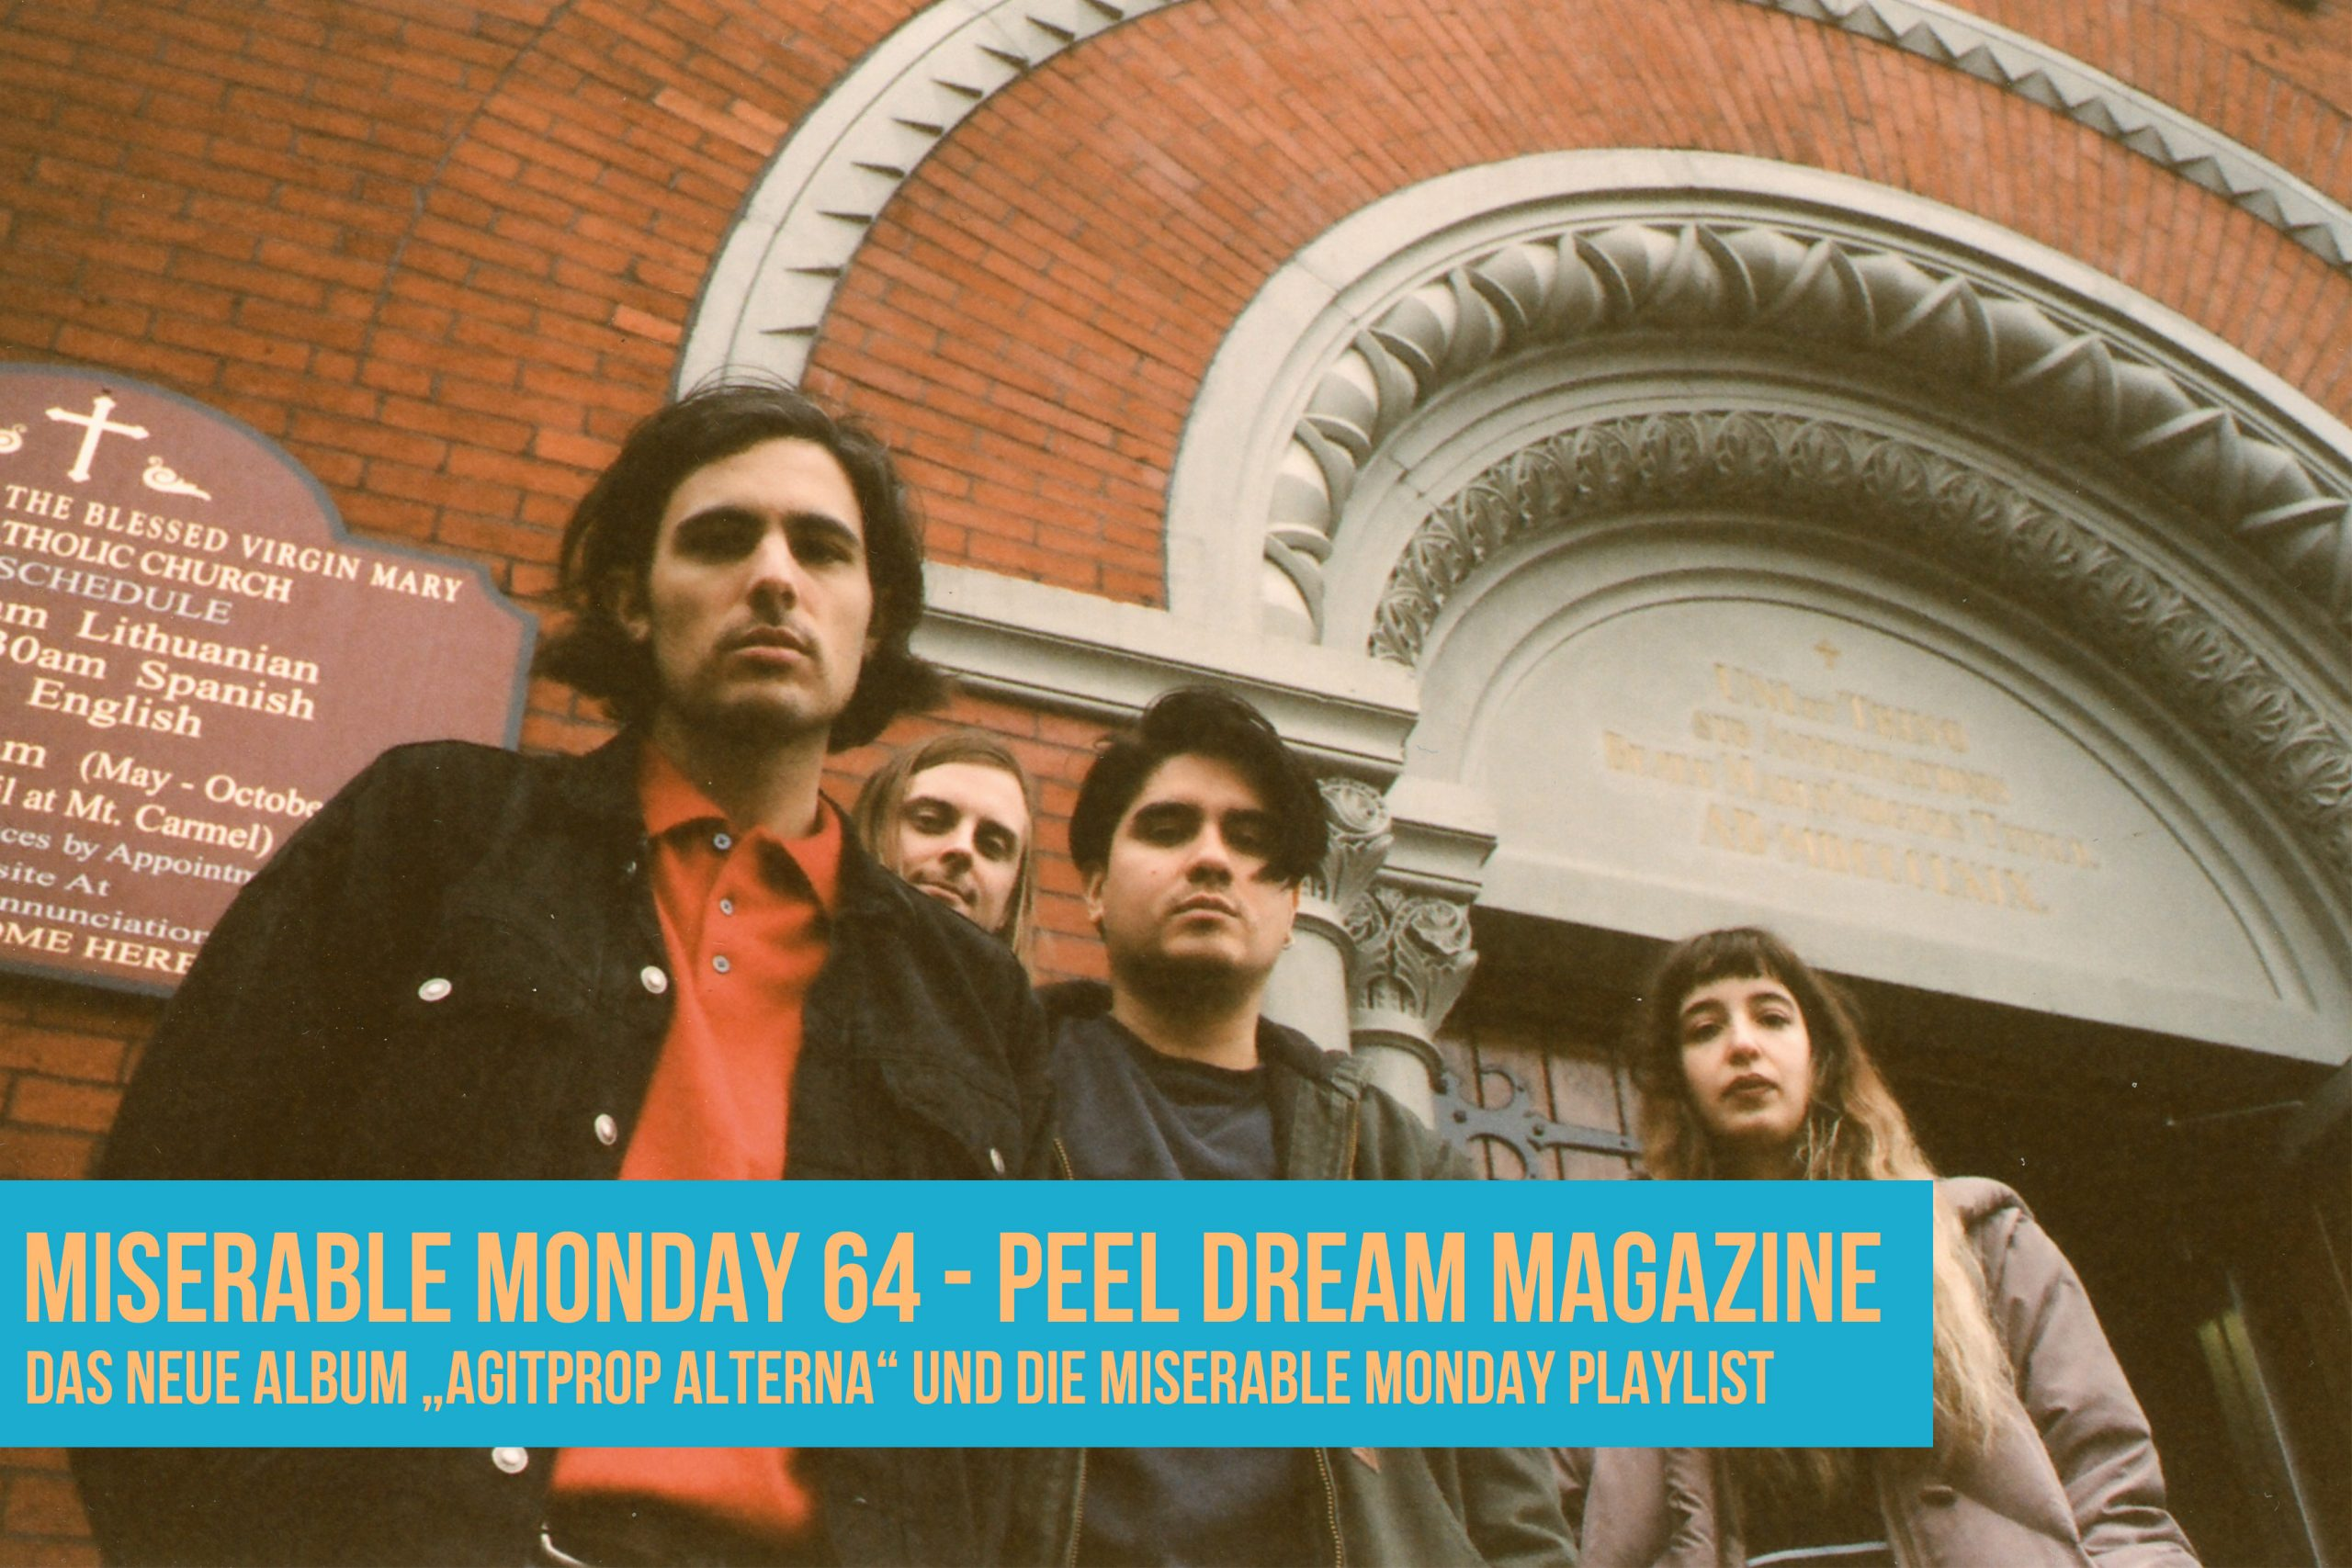 64 - Peel Dream Magazine